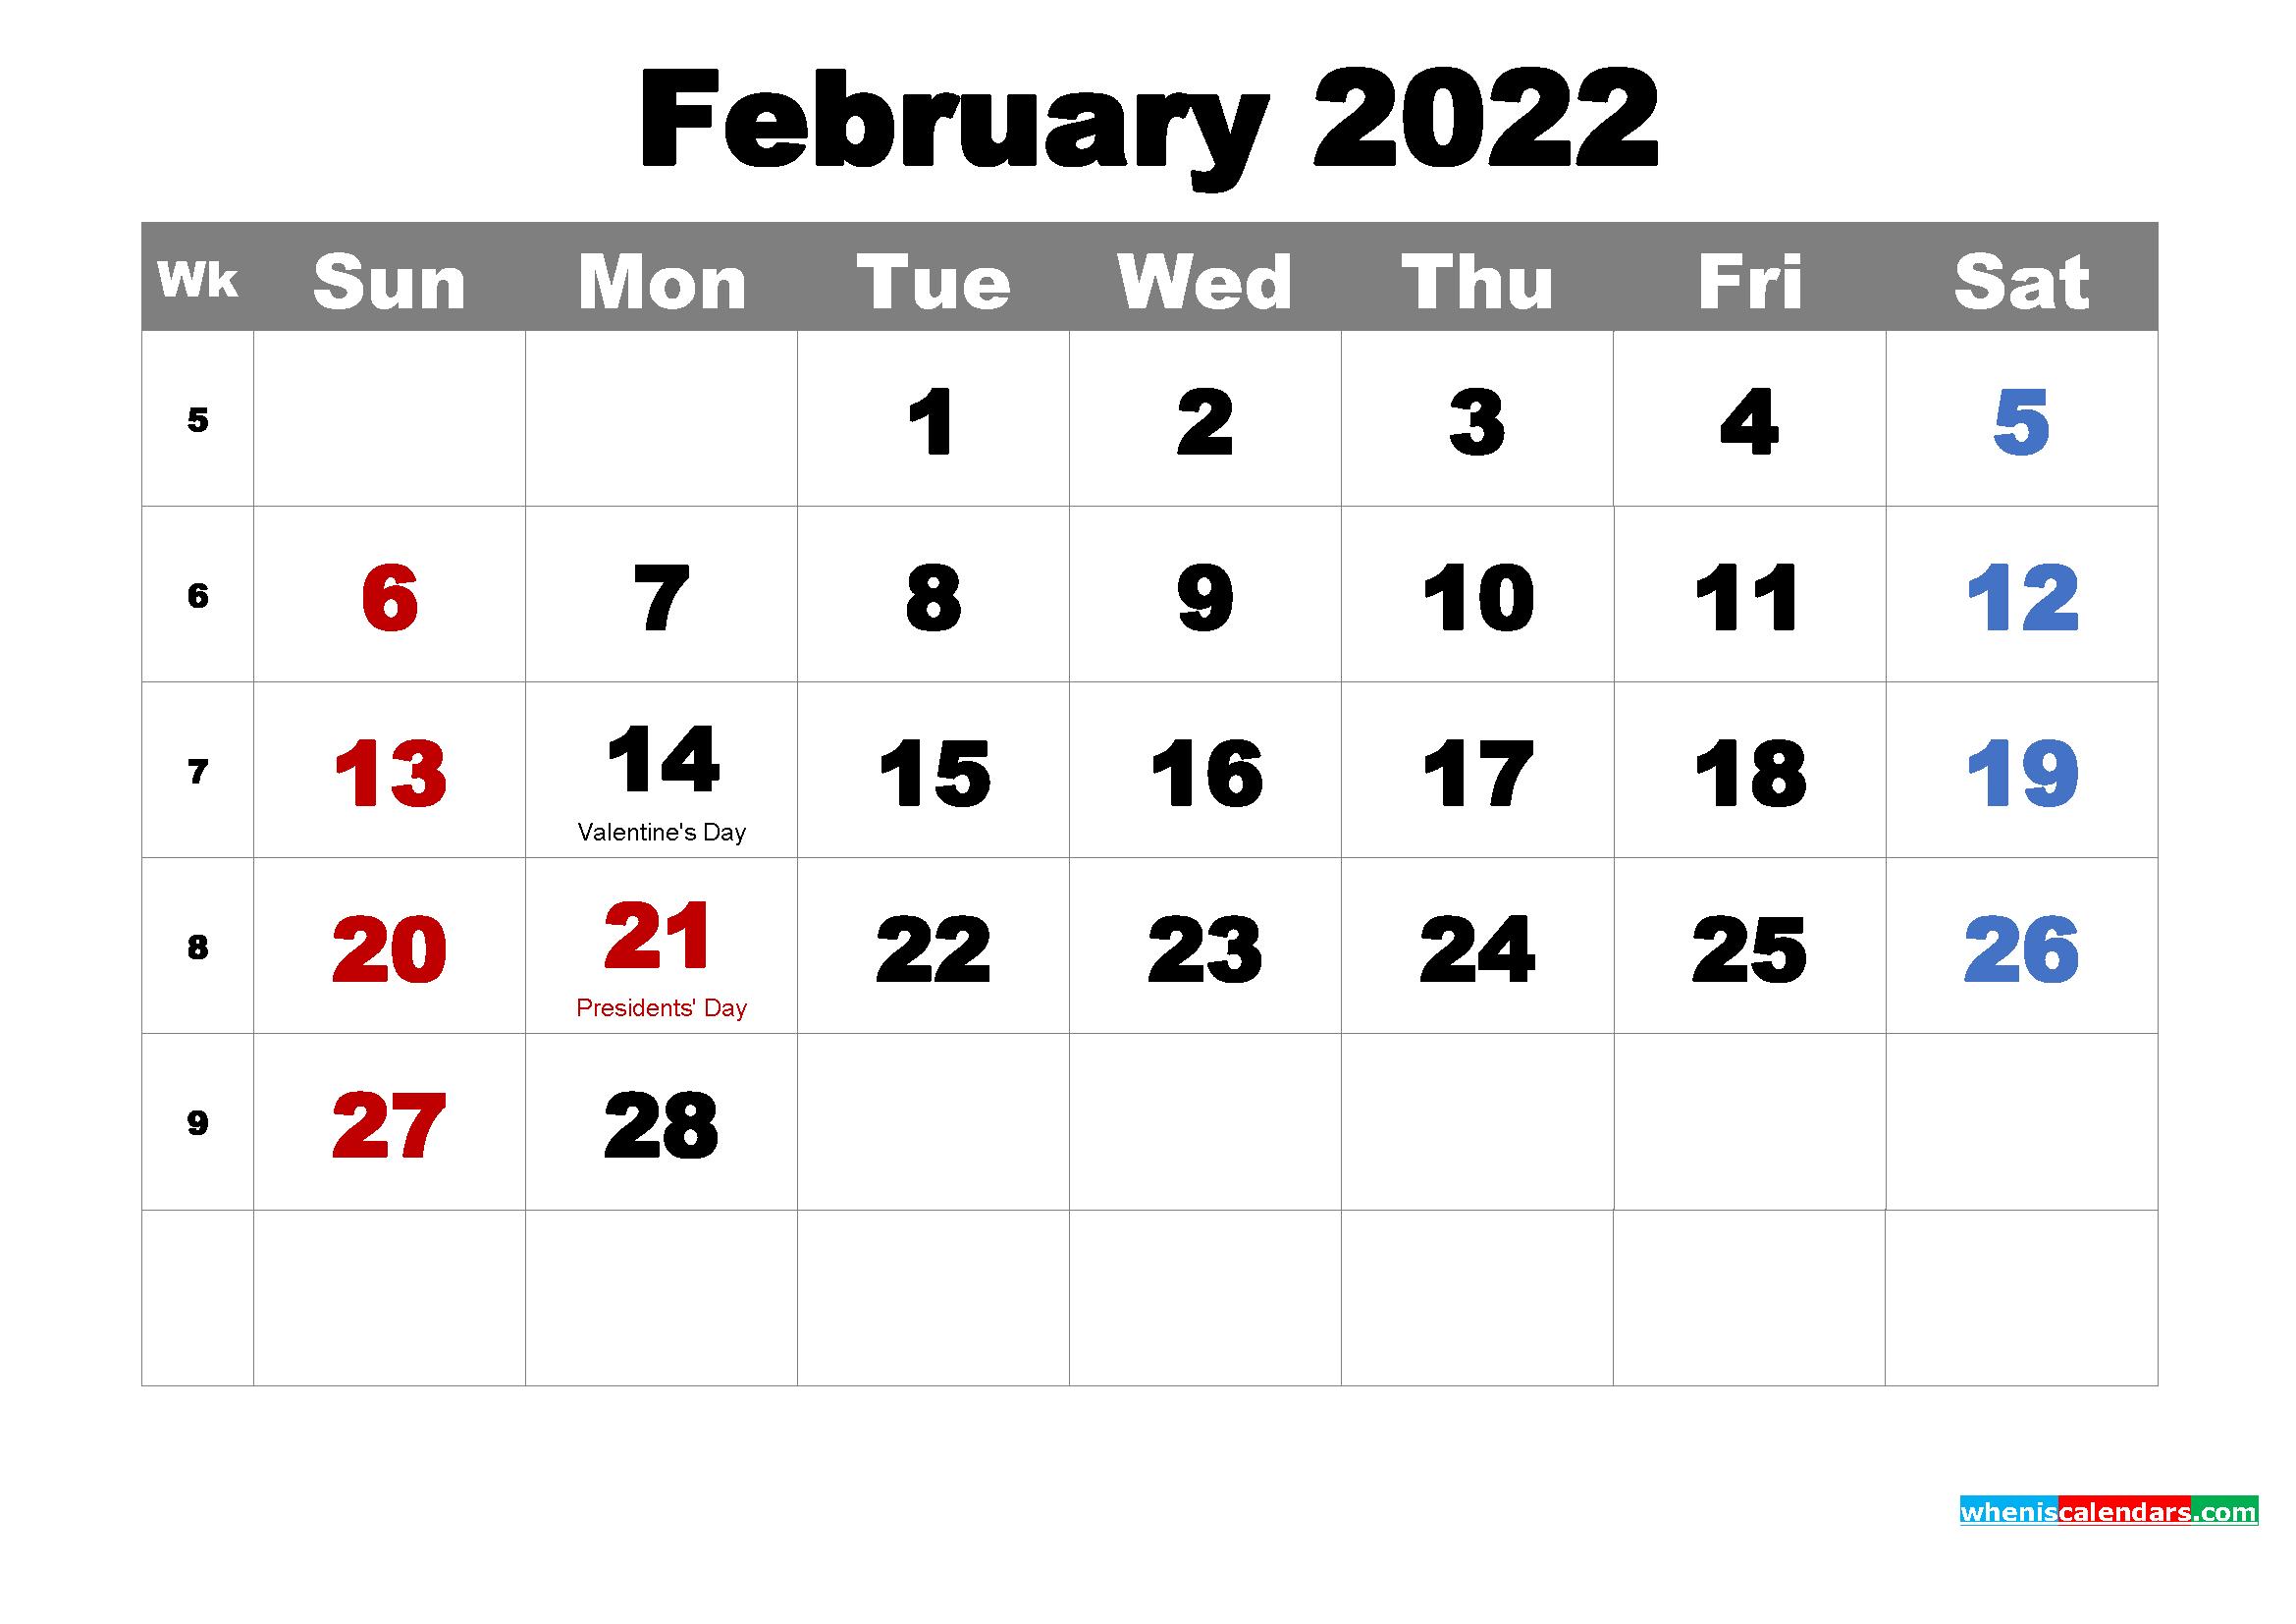 Free Printable February 2022 Calendar With Holidays As With Regard To Free Printable Feb 2022 Calendar Templates